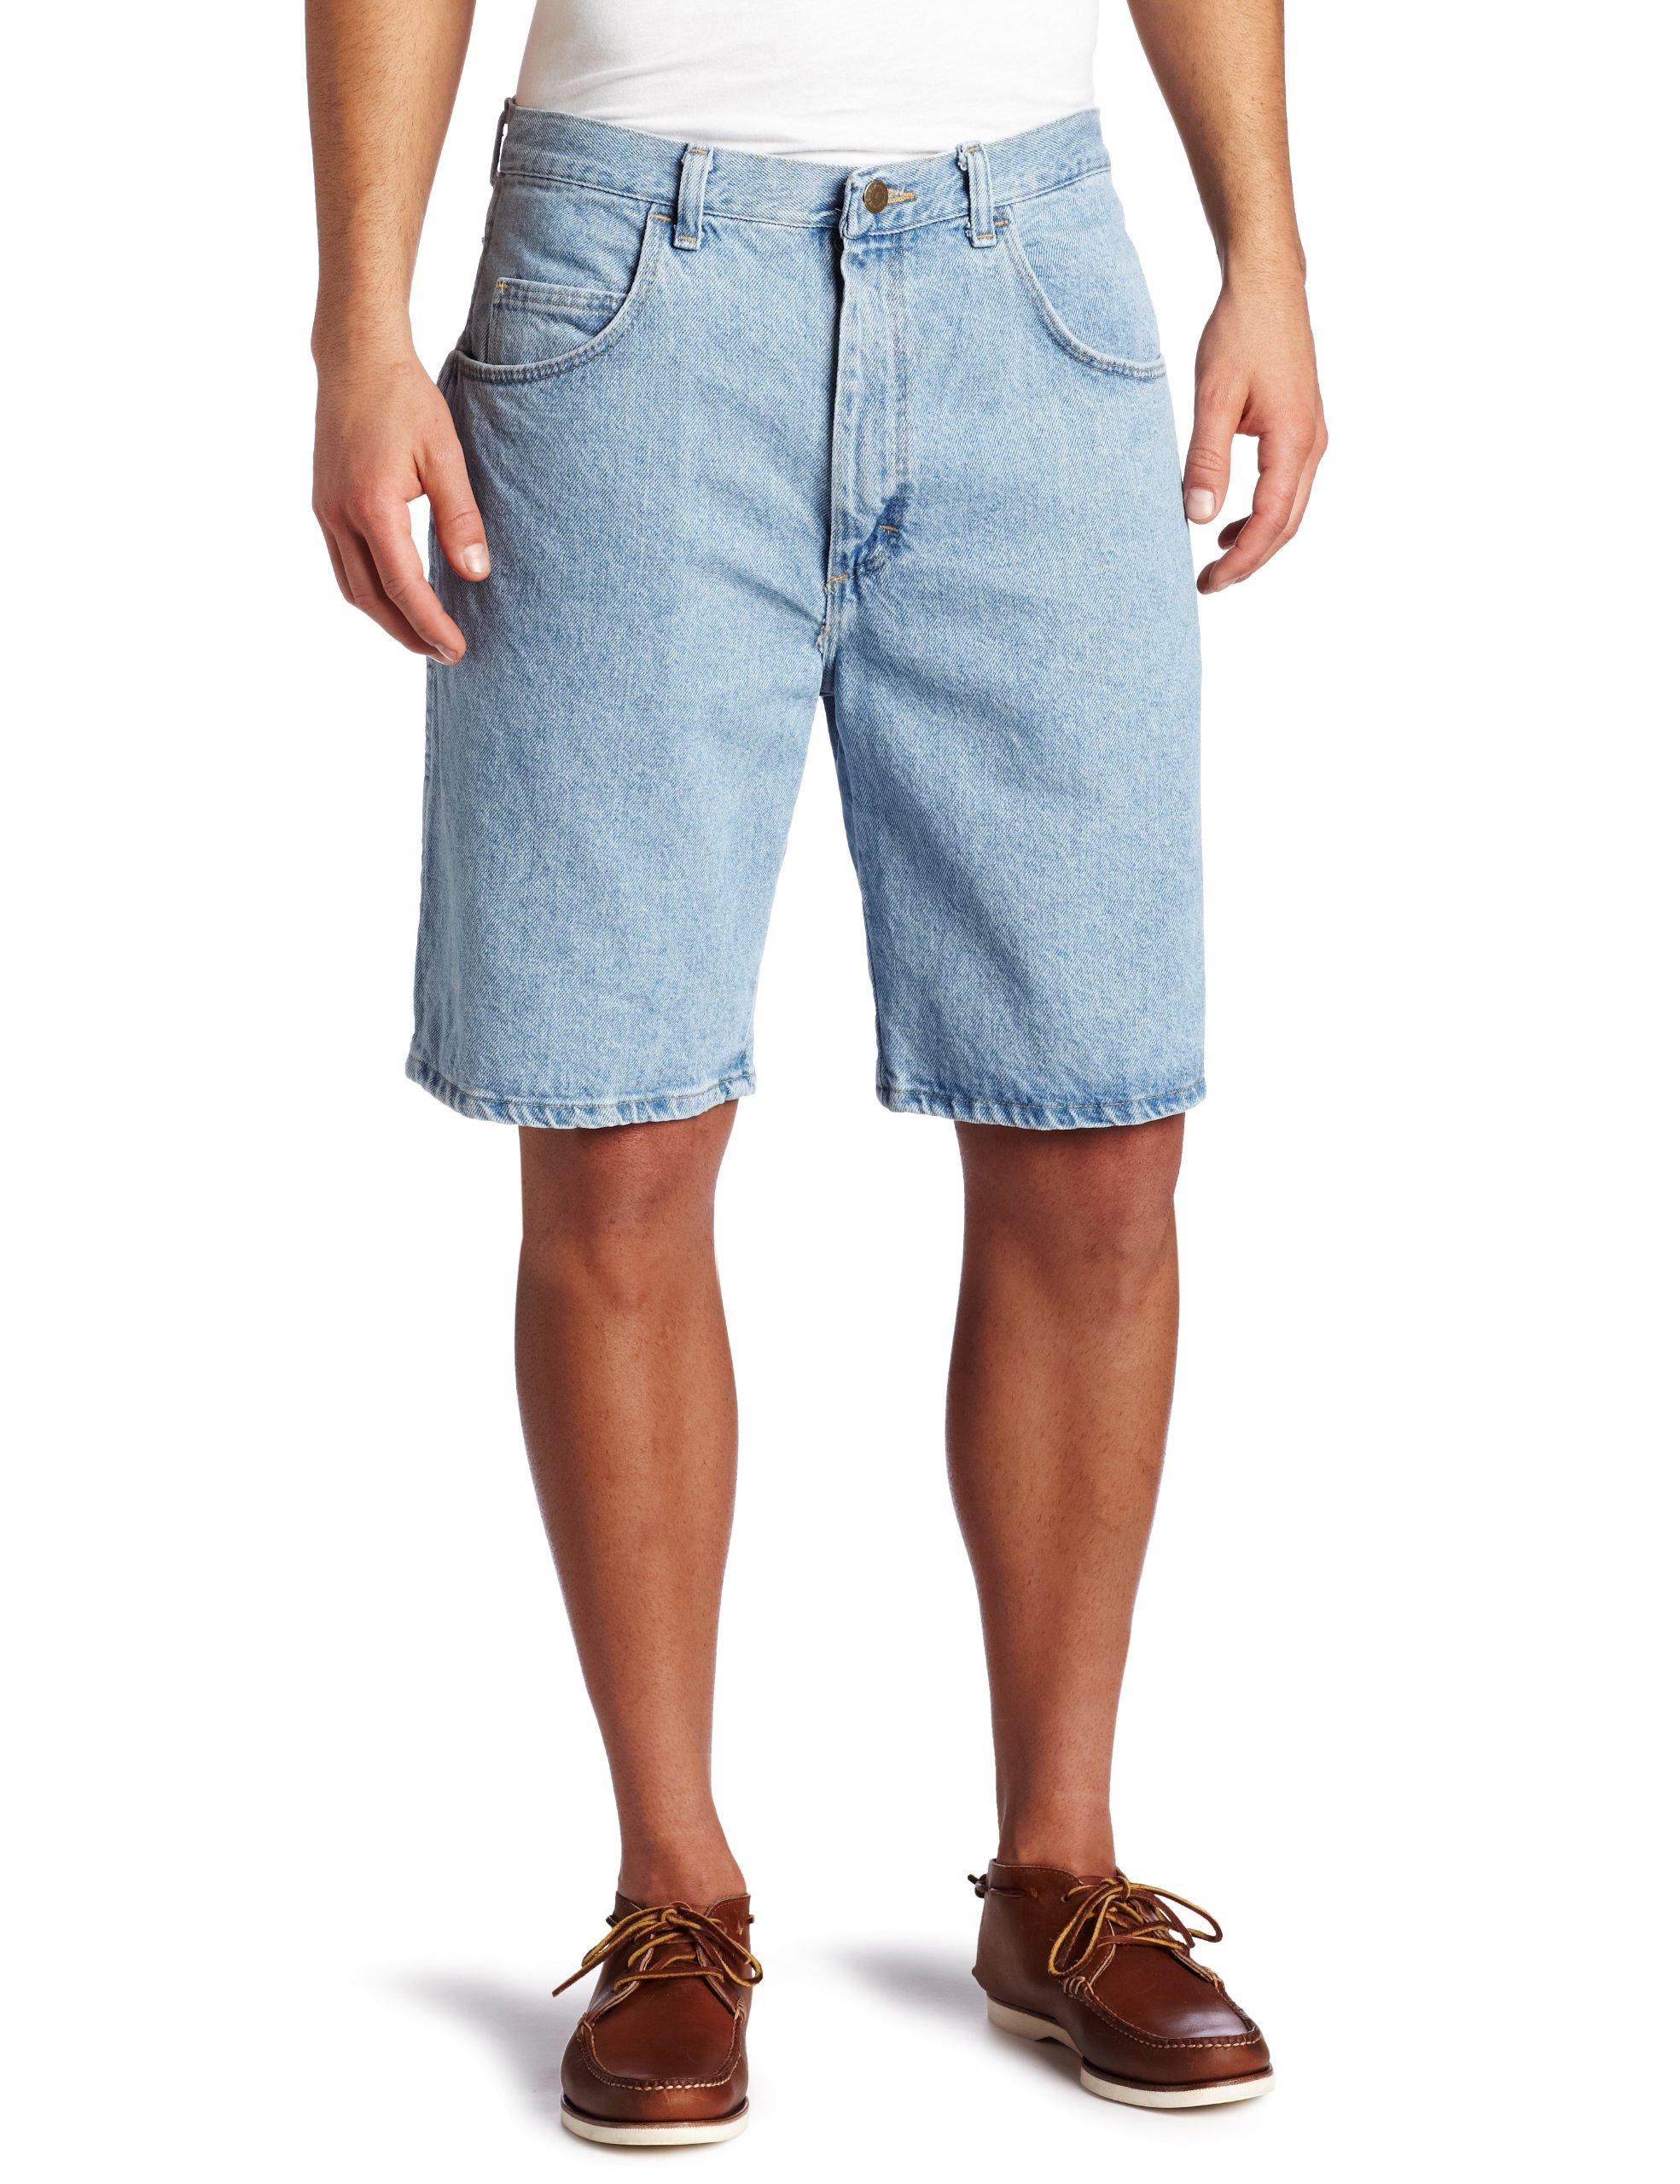 Wrangler Men's Rugged Wear Relaxed Fit Short, Vintage Indigo, 32